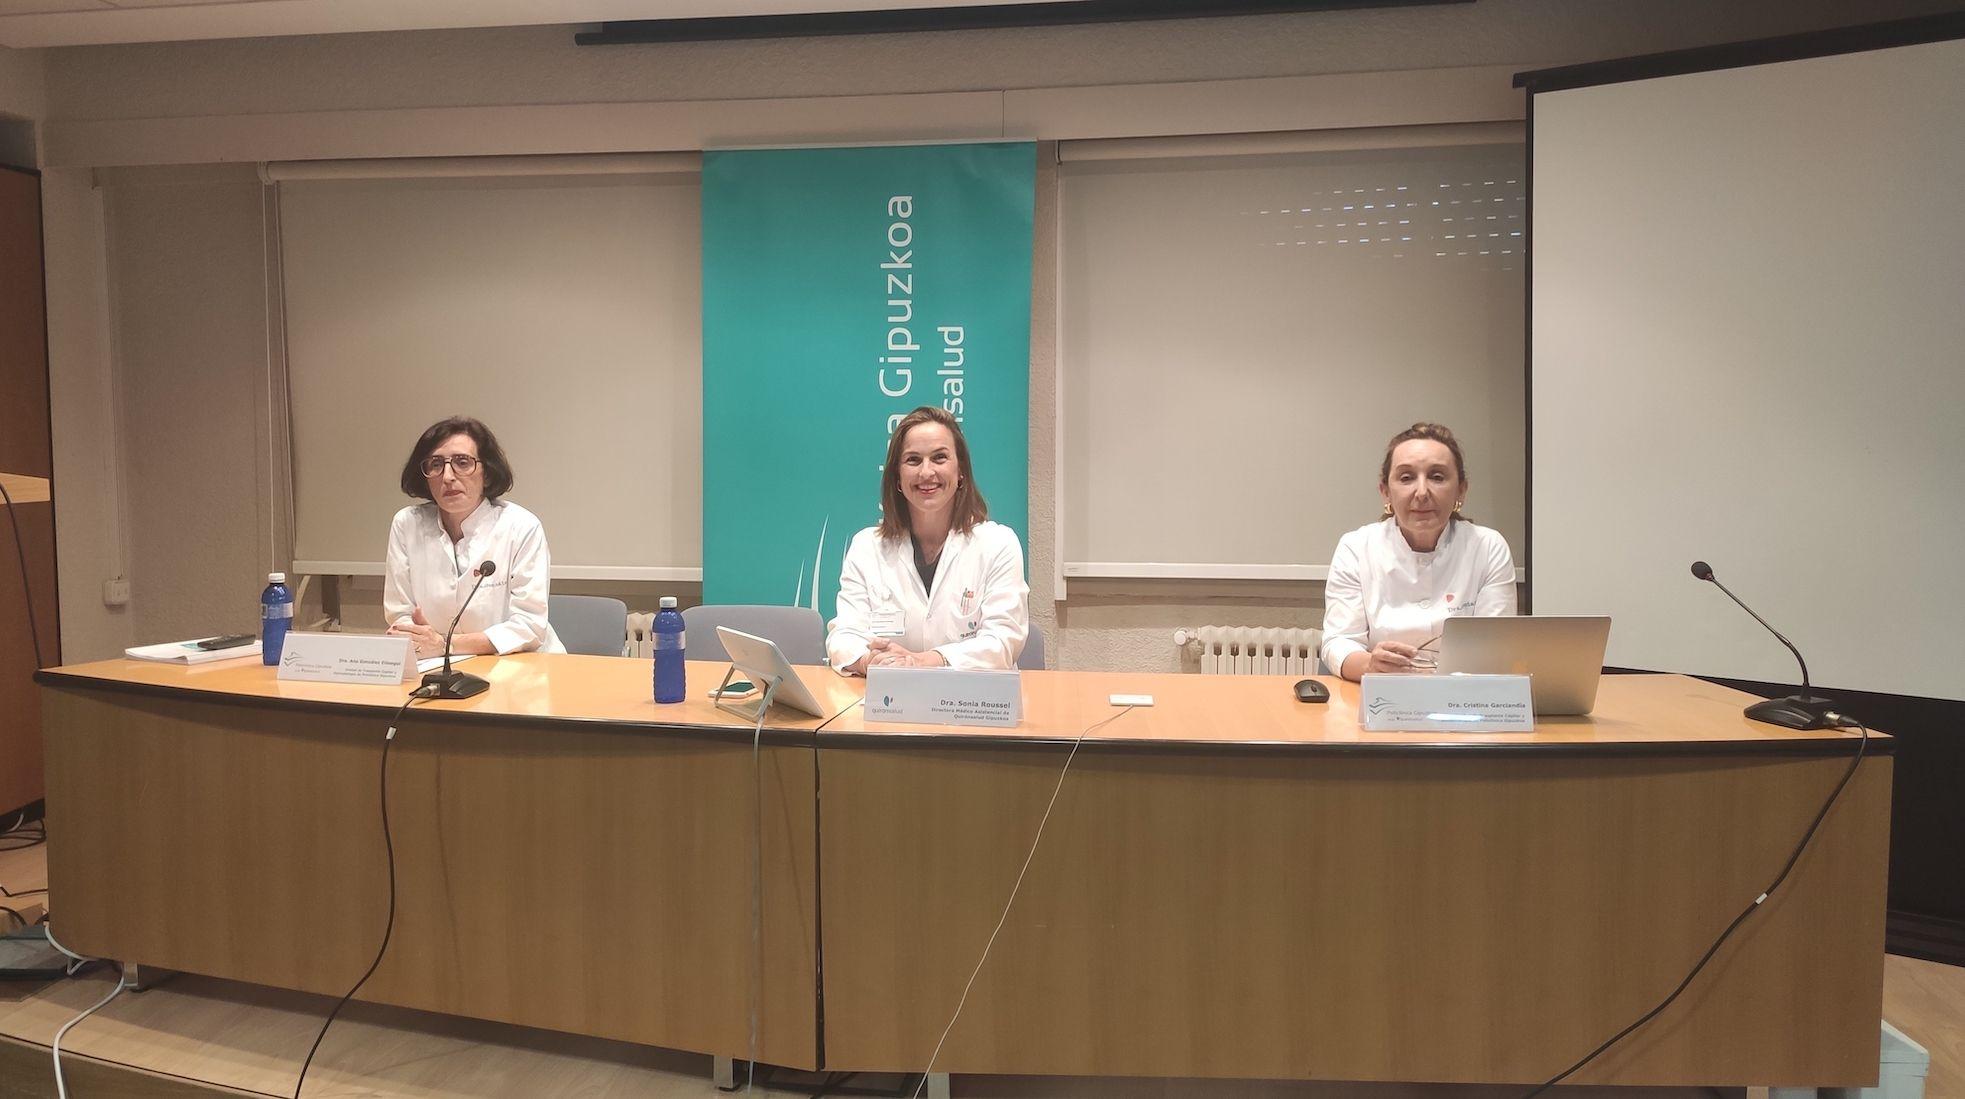 Aumenta la demanda de trasplantes capilares en Policlínica Gipuzkoa